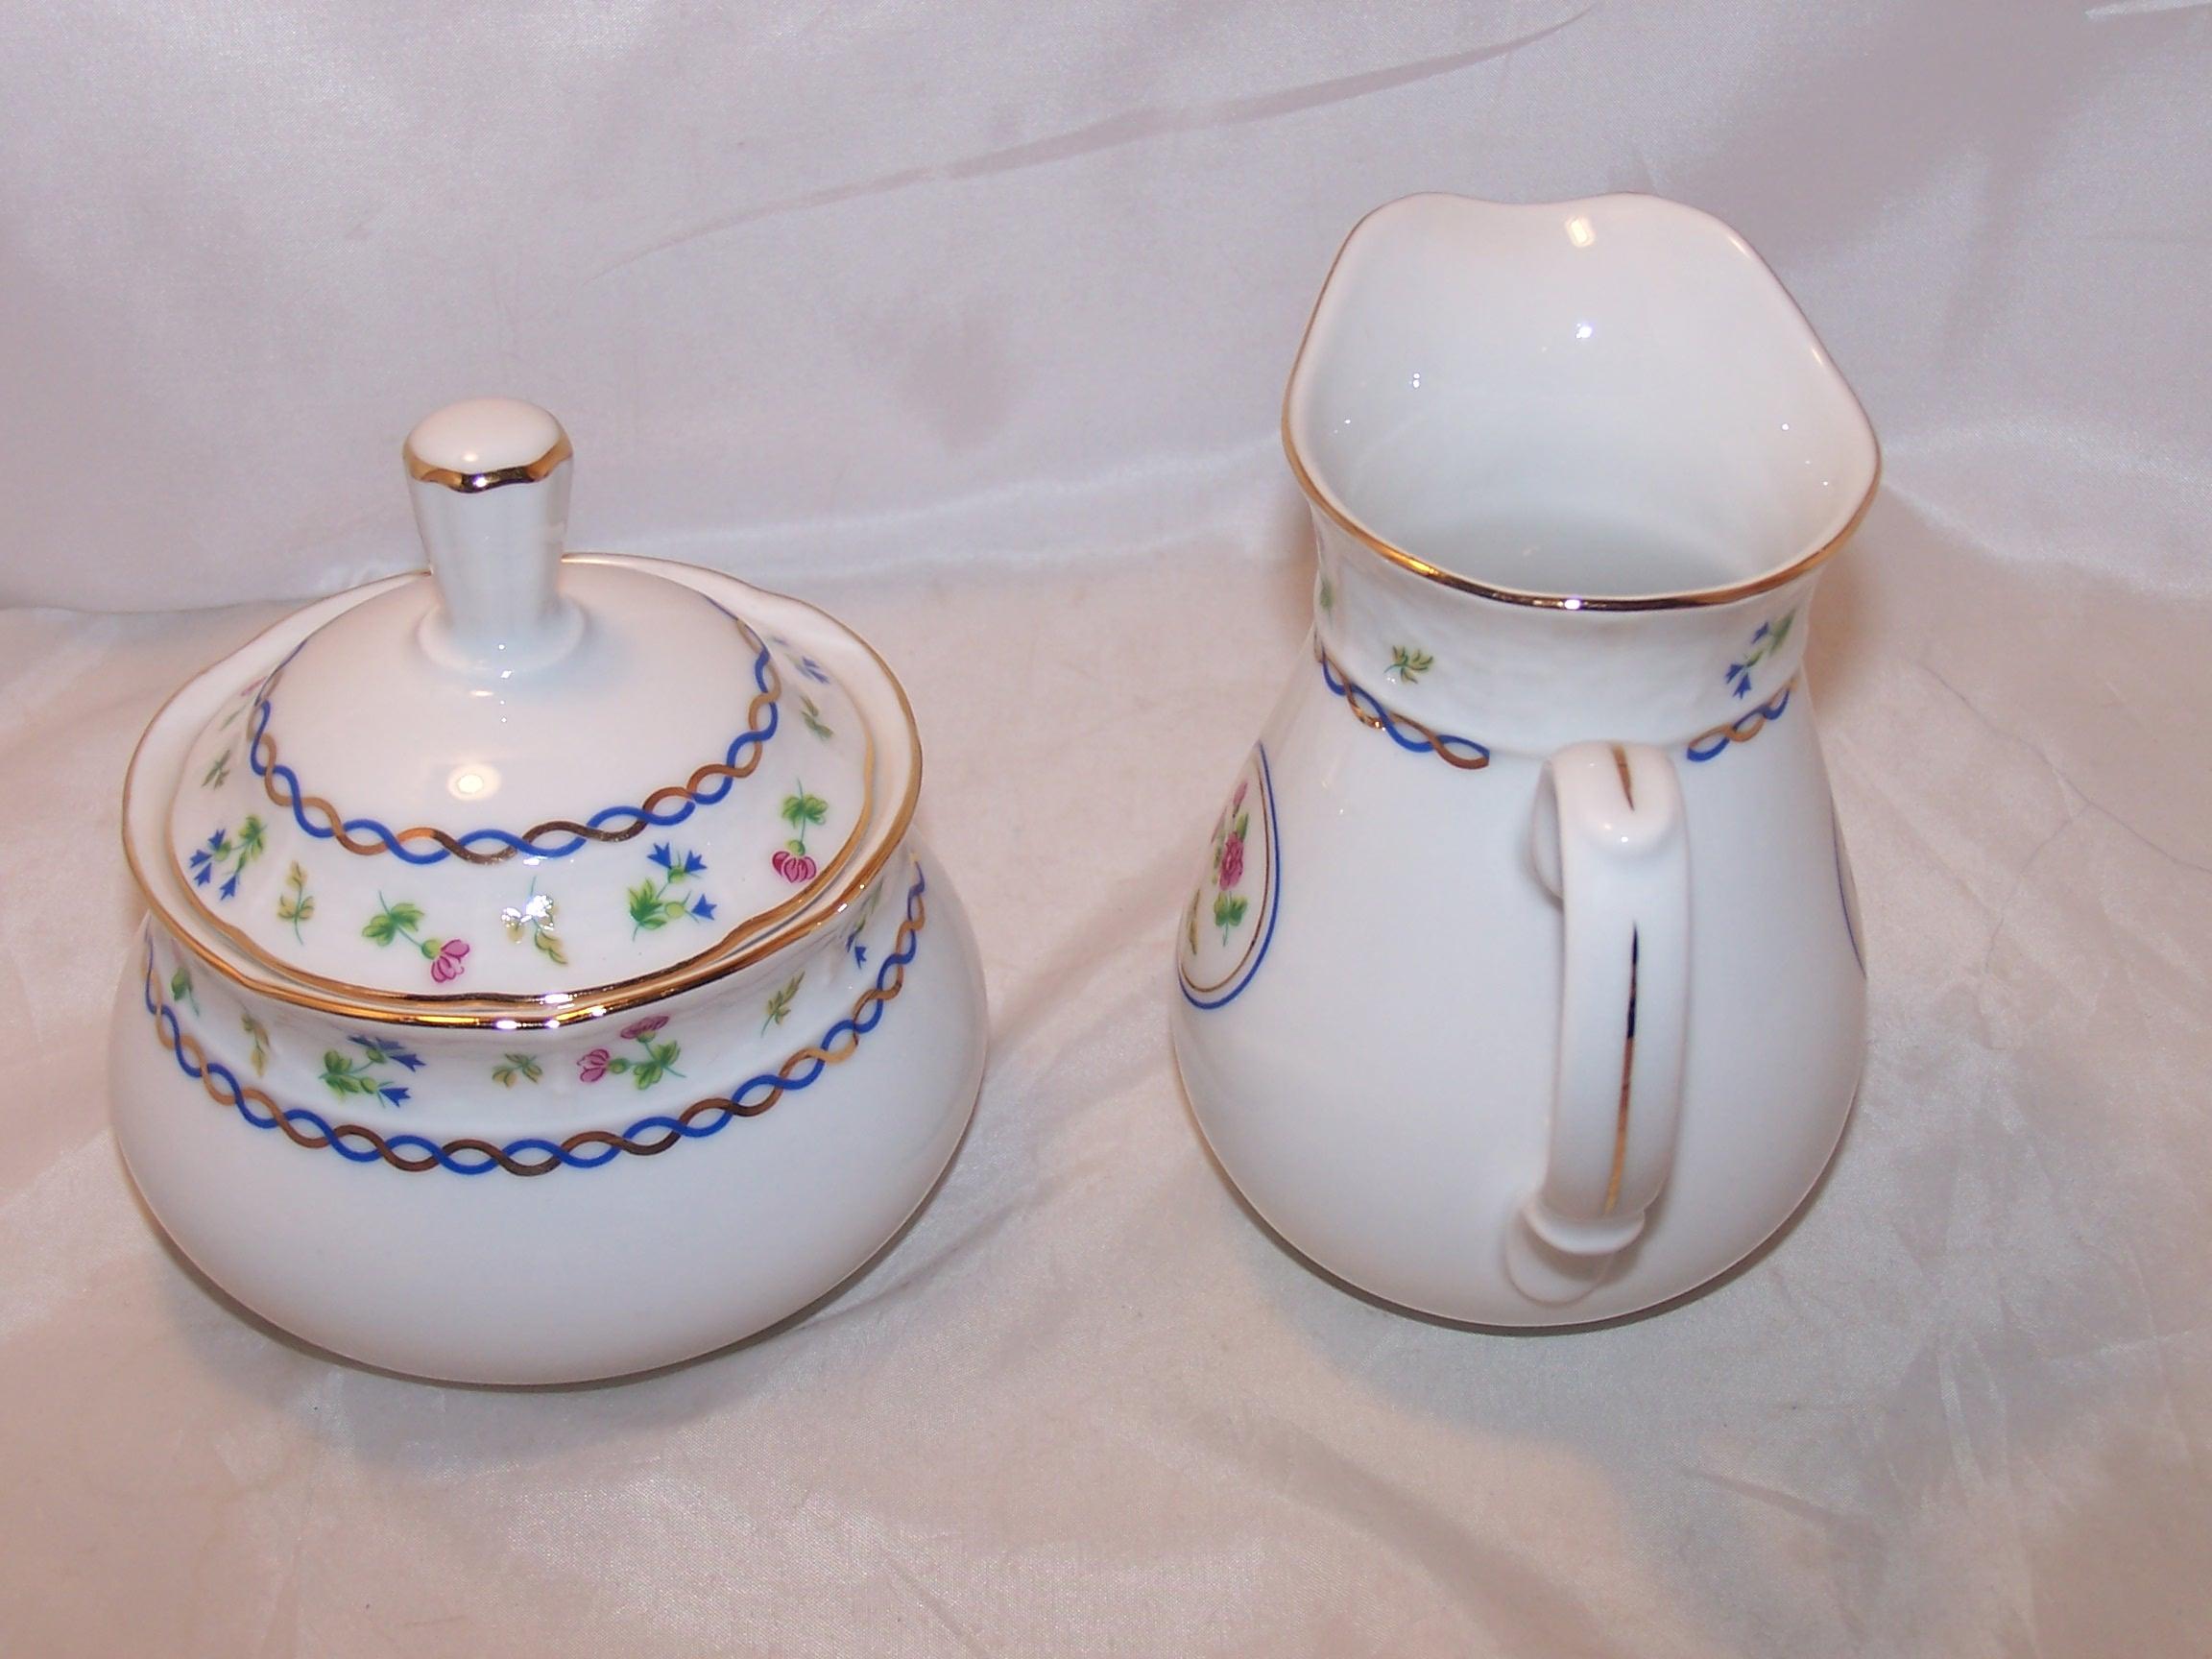 Image 1 of Baum Bros Thun Porcelain Creamer and Sugar, Czechoslovakia